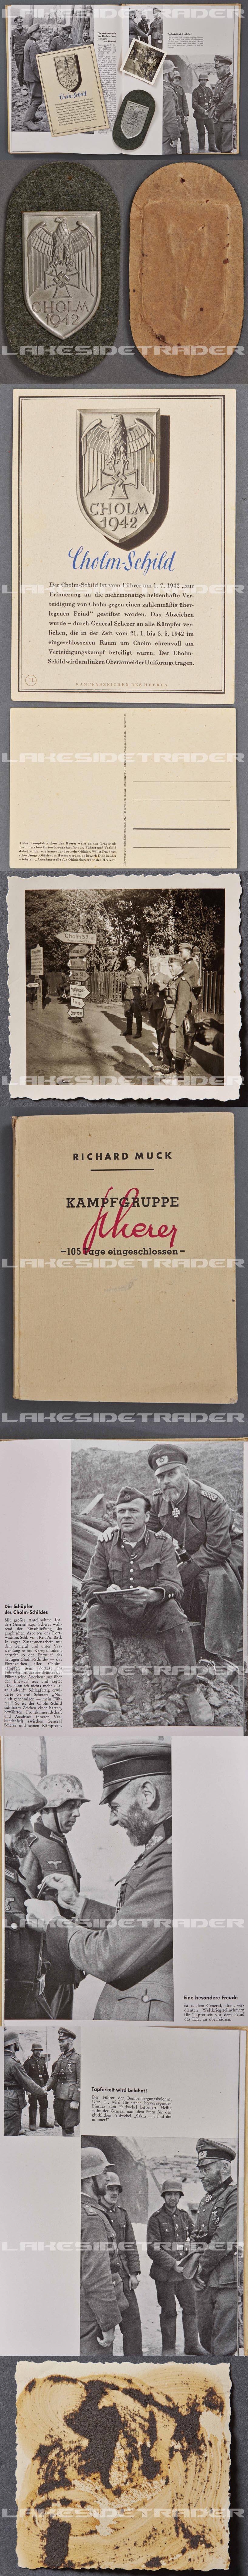 Cholm Shield, Postcard, Photo & Presentation Book 1943